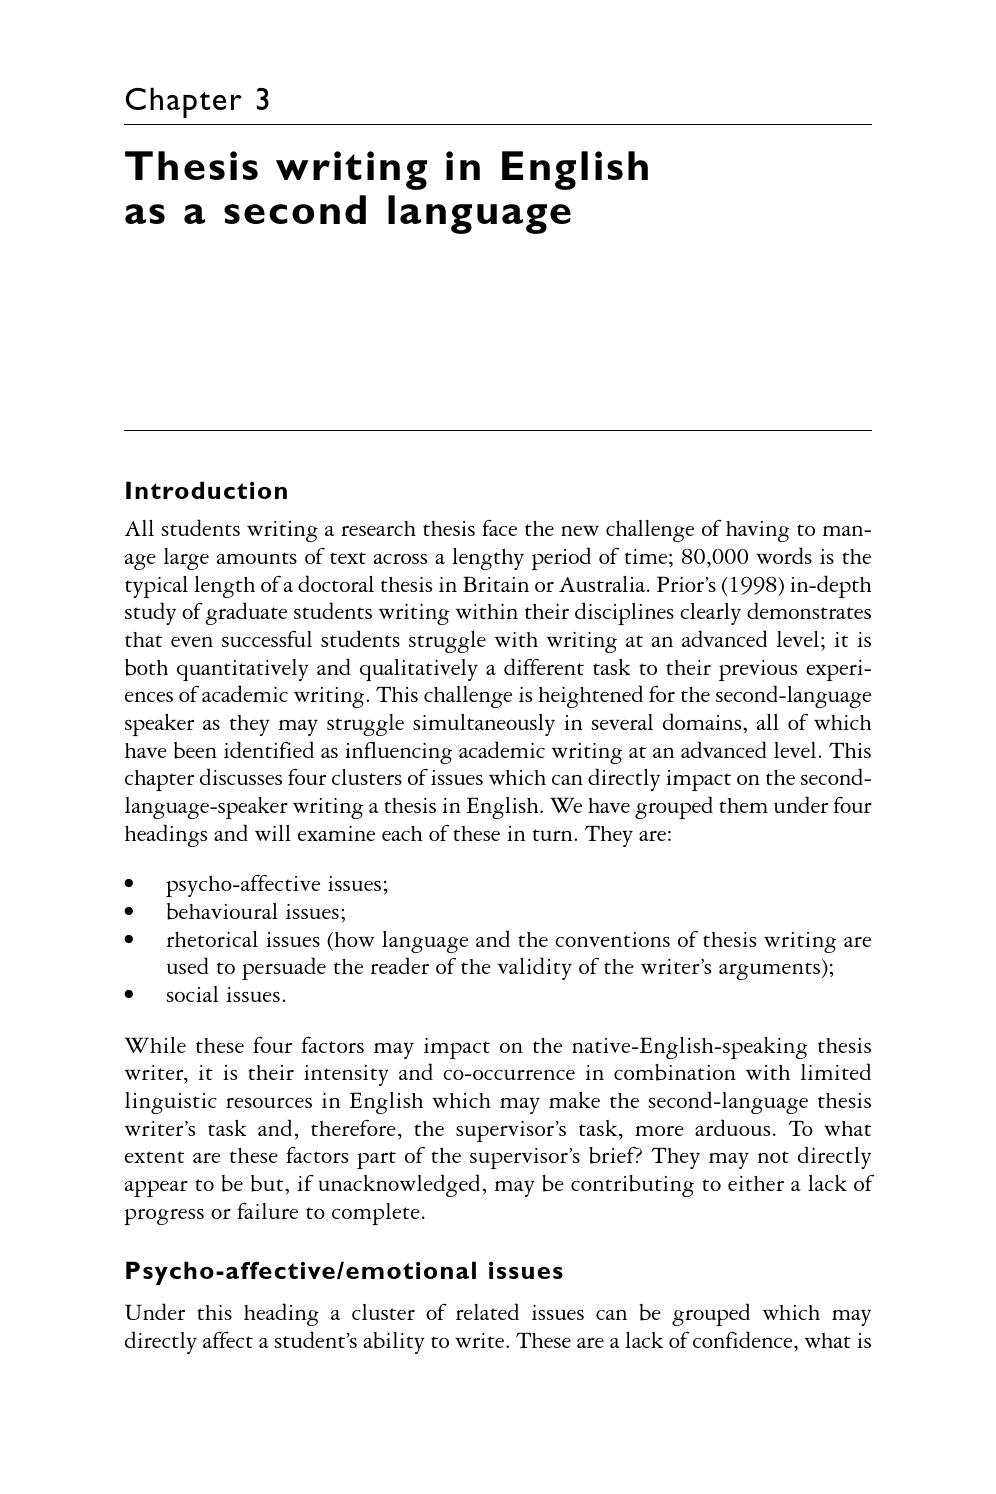 Free essay writers online